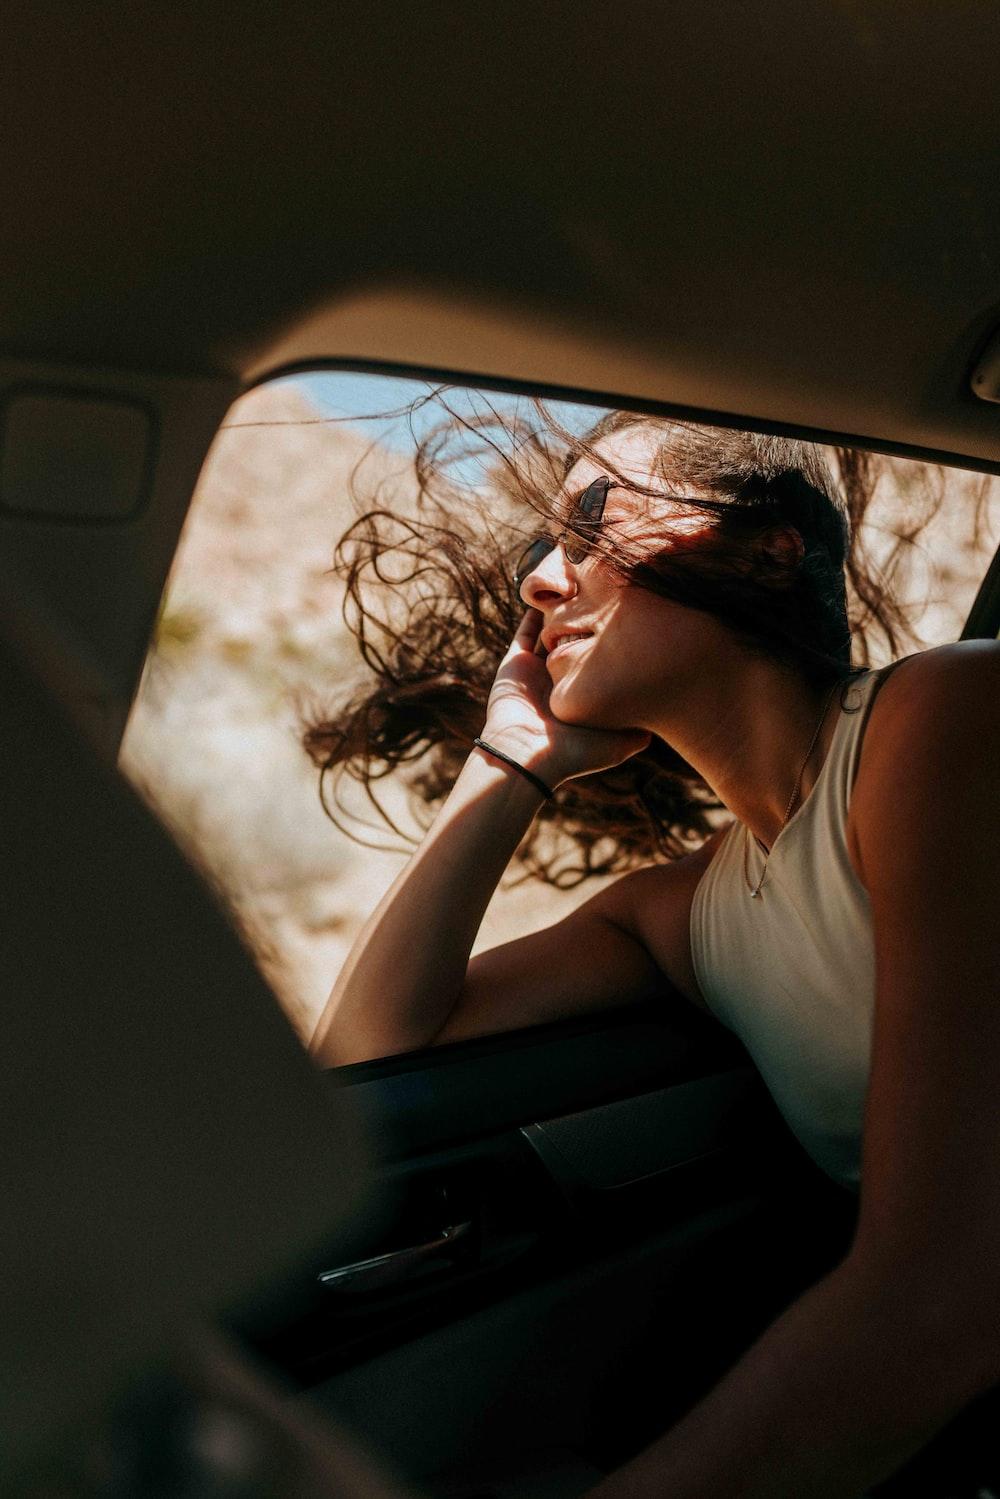 woman in white tank top sitting inside car during daytime